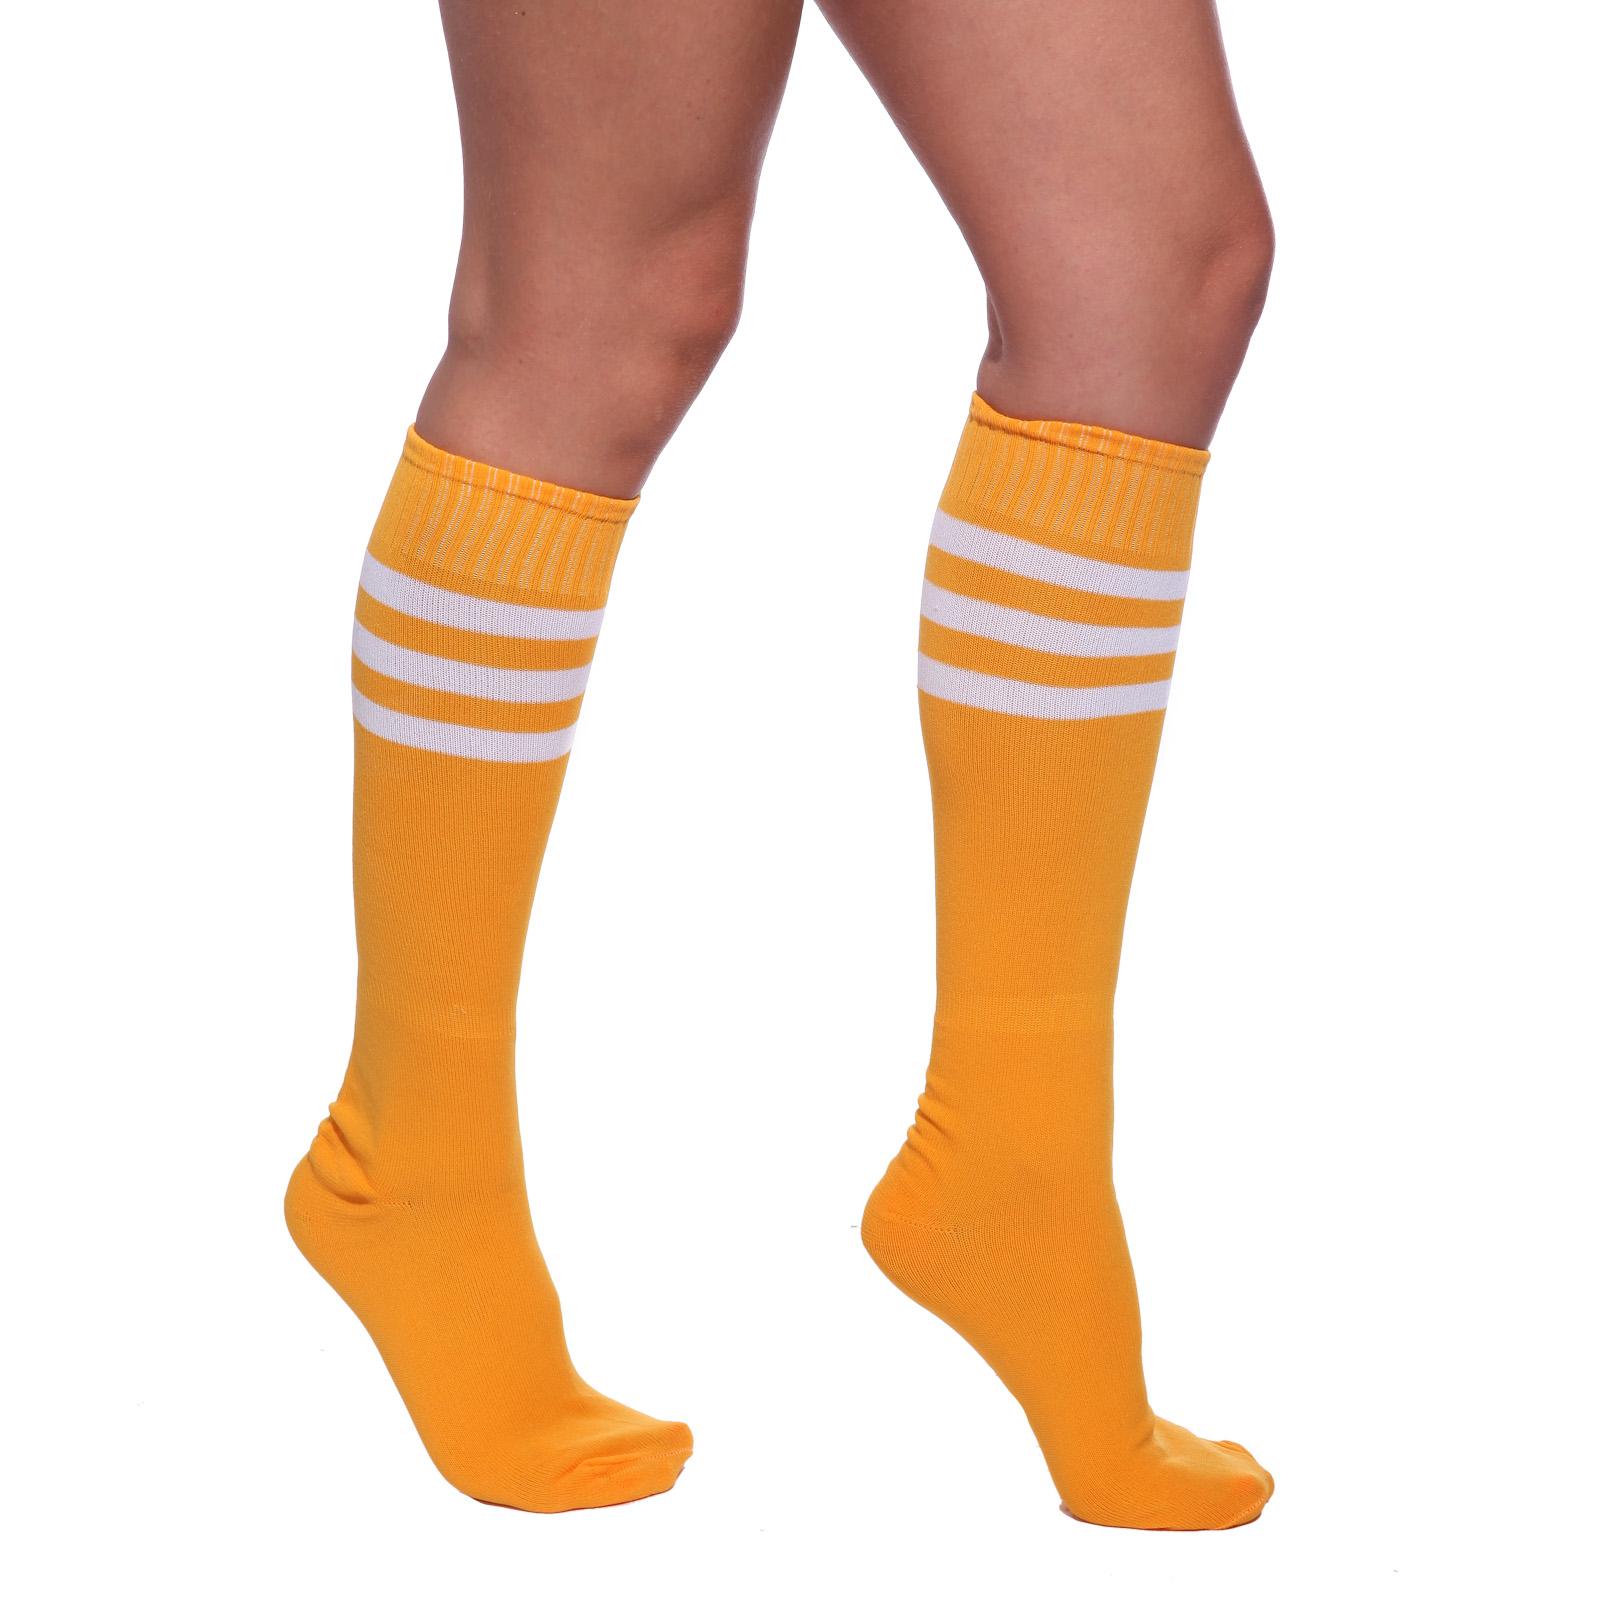 how to wear adult knee socks